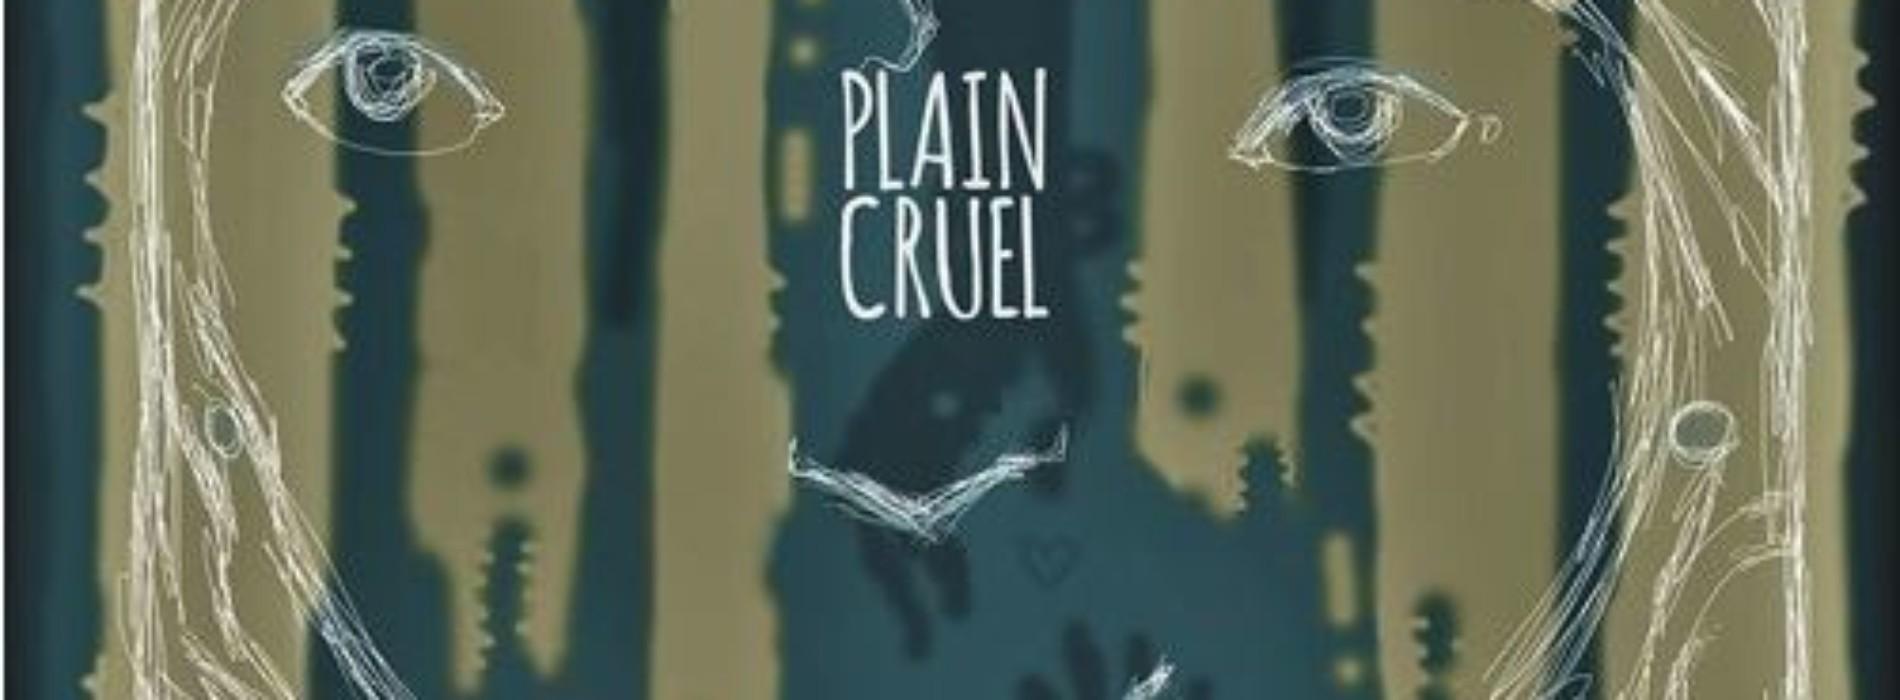 Aaron : Plain Cruel